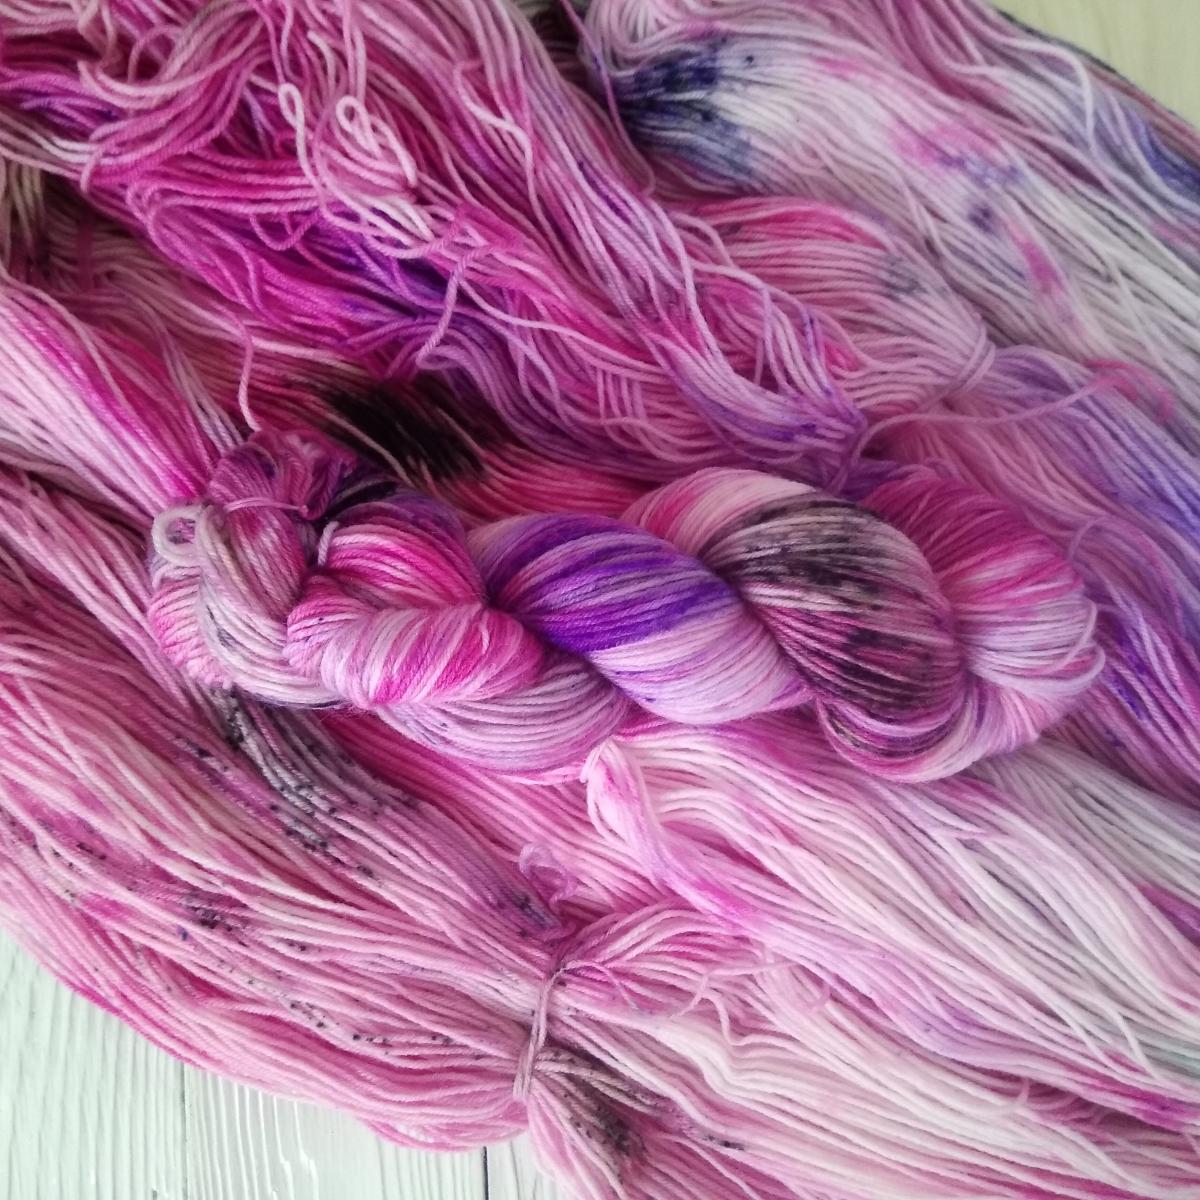 woodico.pro hand dyed yarn 041 4 1200x1200 - Hand dyed yarn / 041